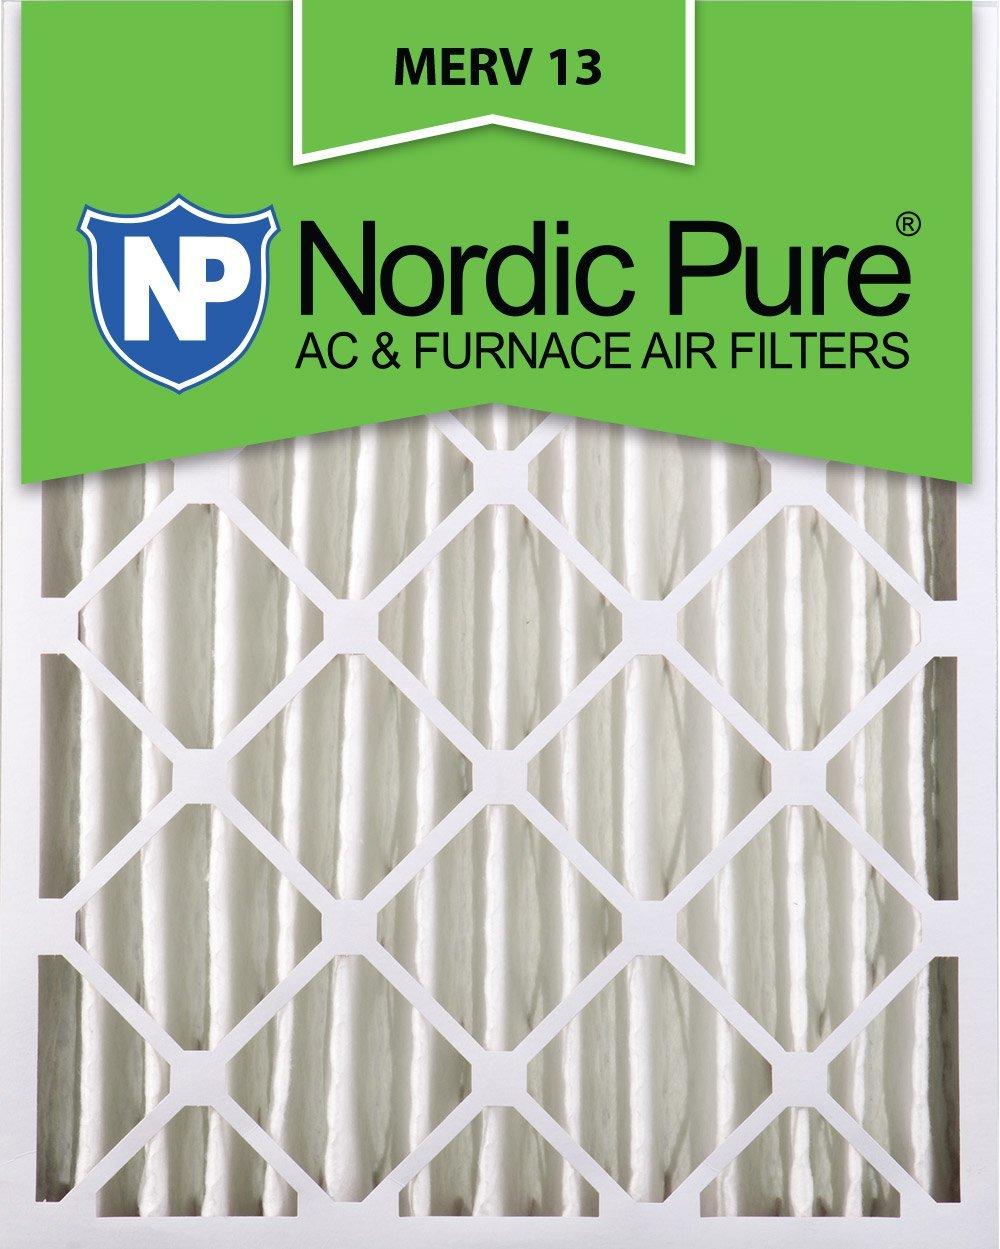 Nordic Pure 16x25x4M13-2 16x25x4 MERV 13 Pleated AC Furnace Air Filter, Box of 2, 4-Inch